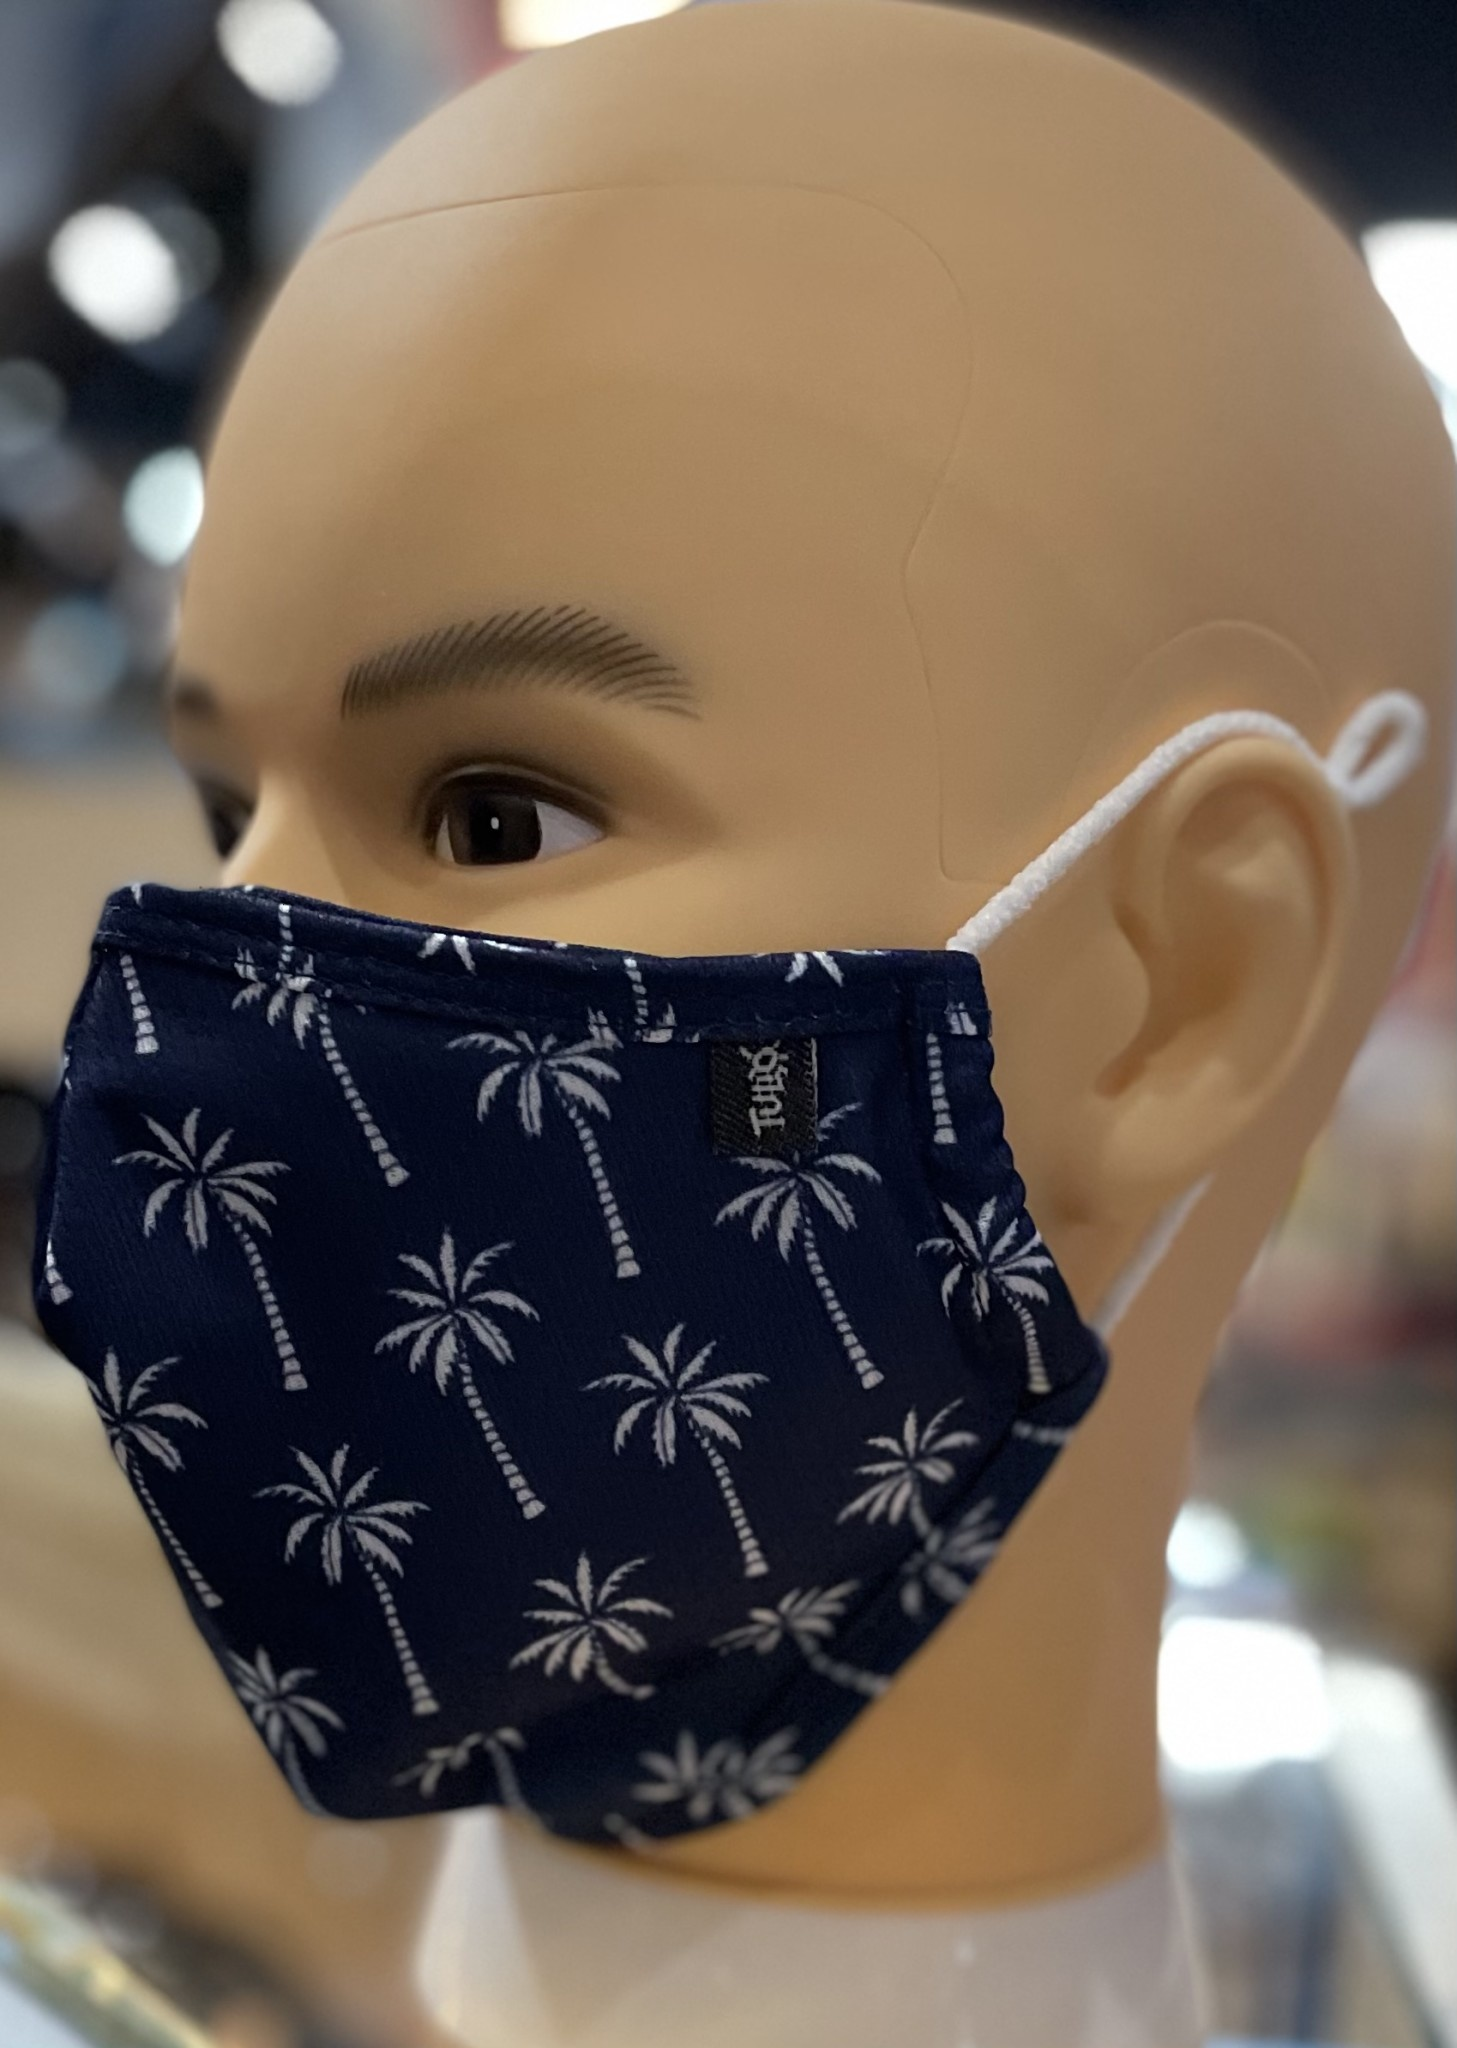 XL Face Mask, Bigger bear sized. Palm Trees Navy